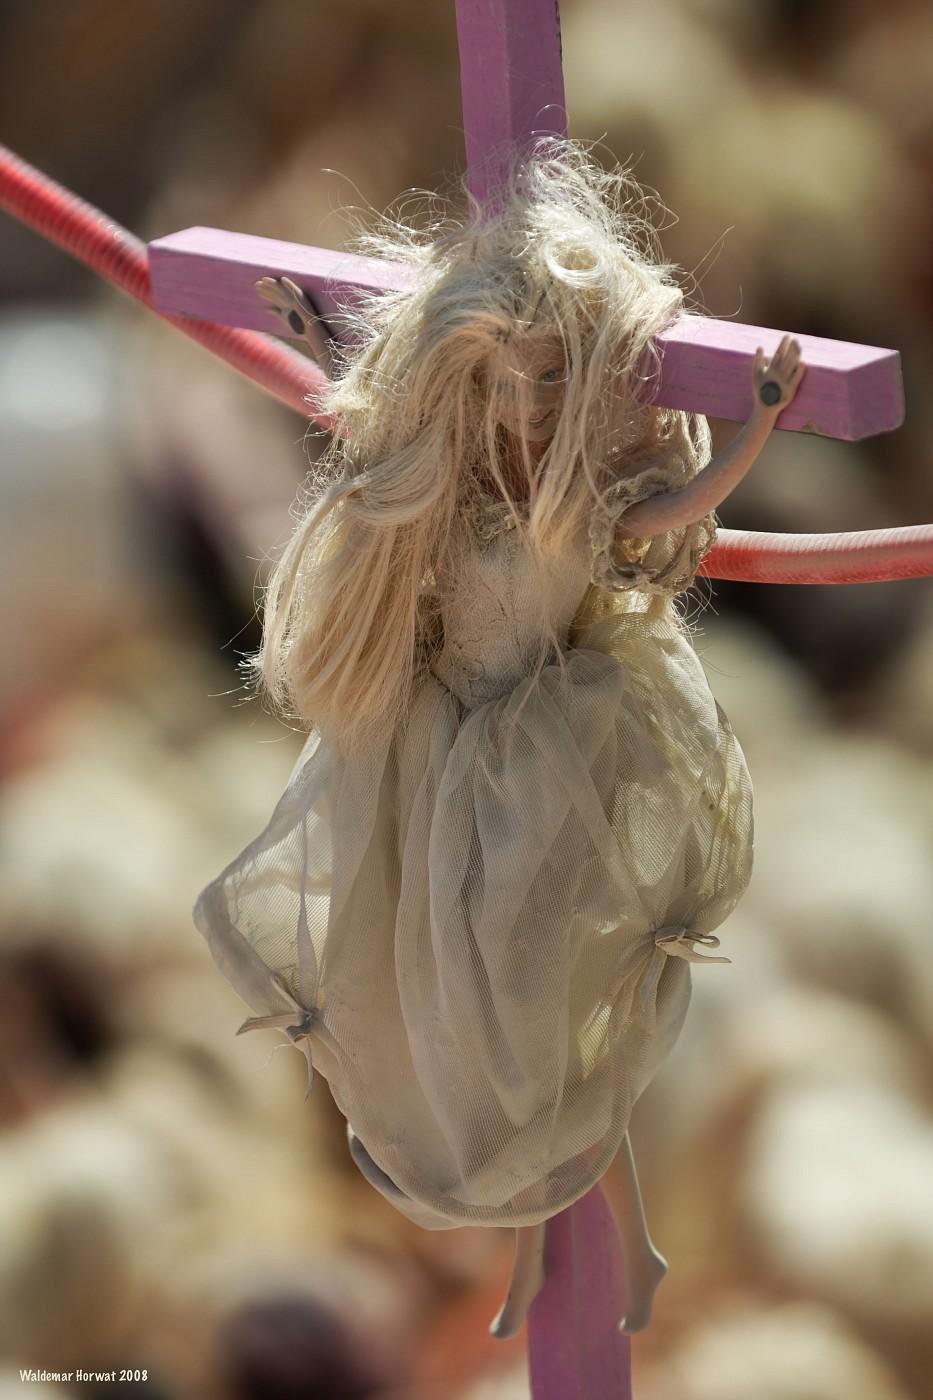 Crucified Barbie